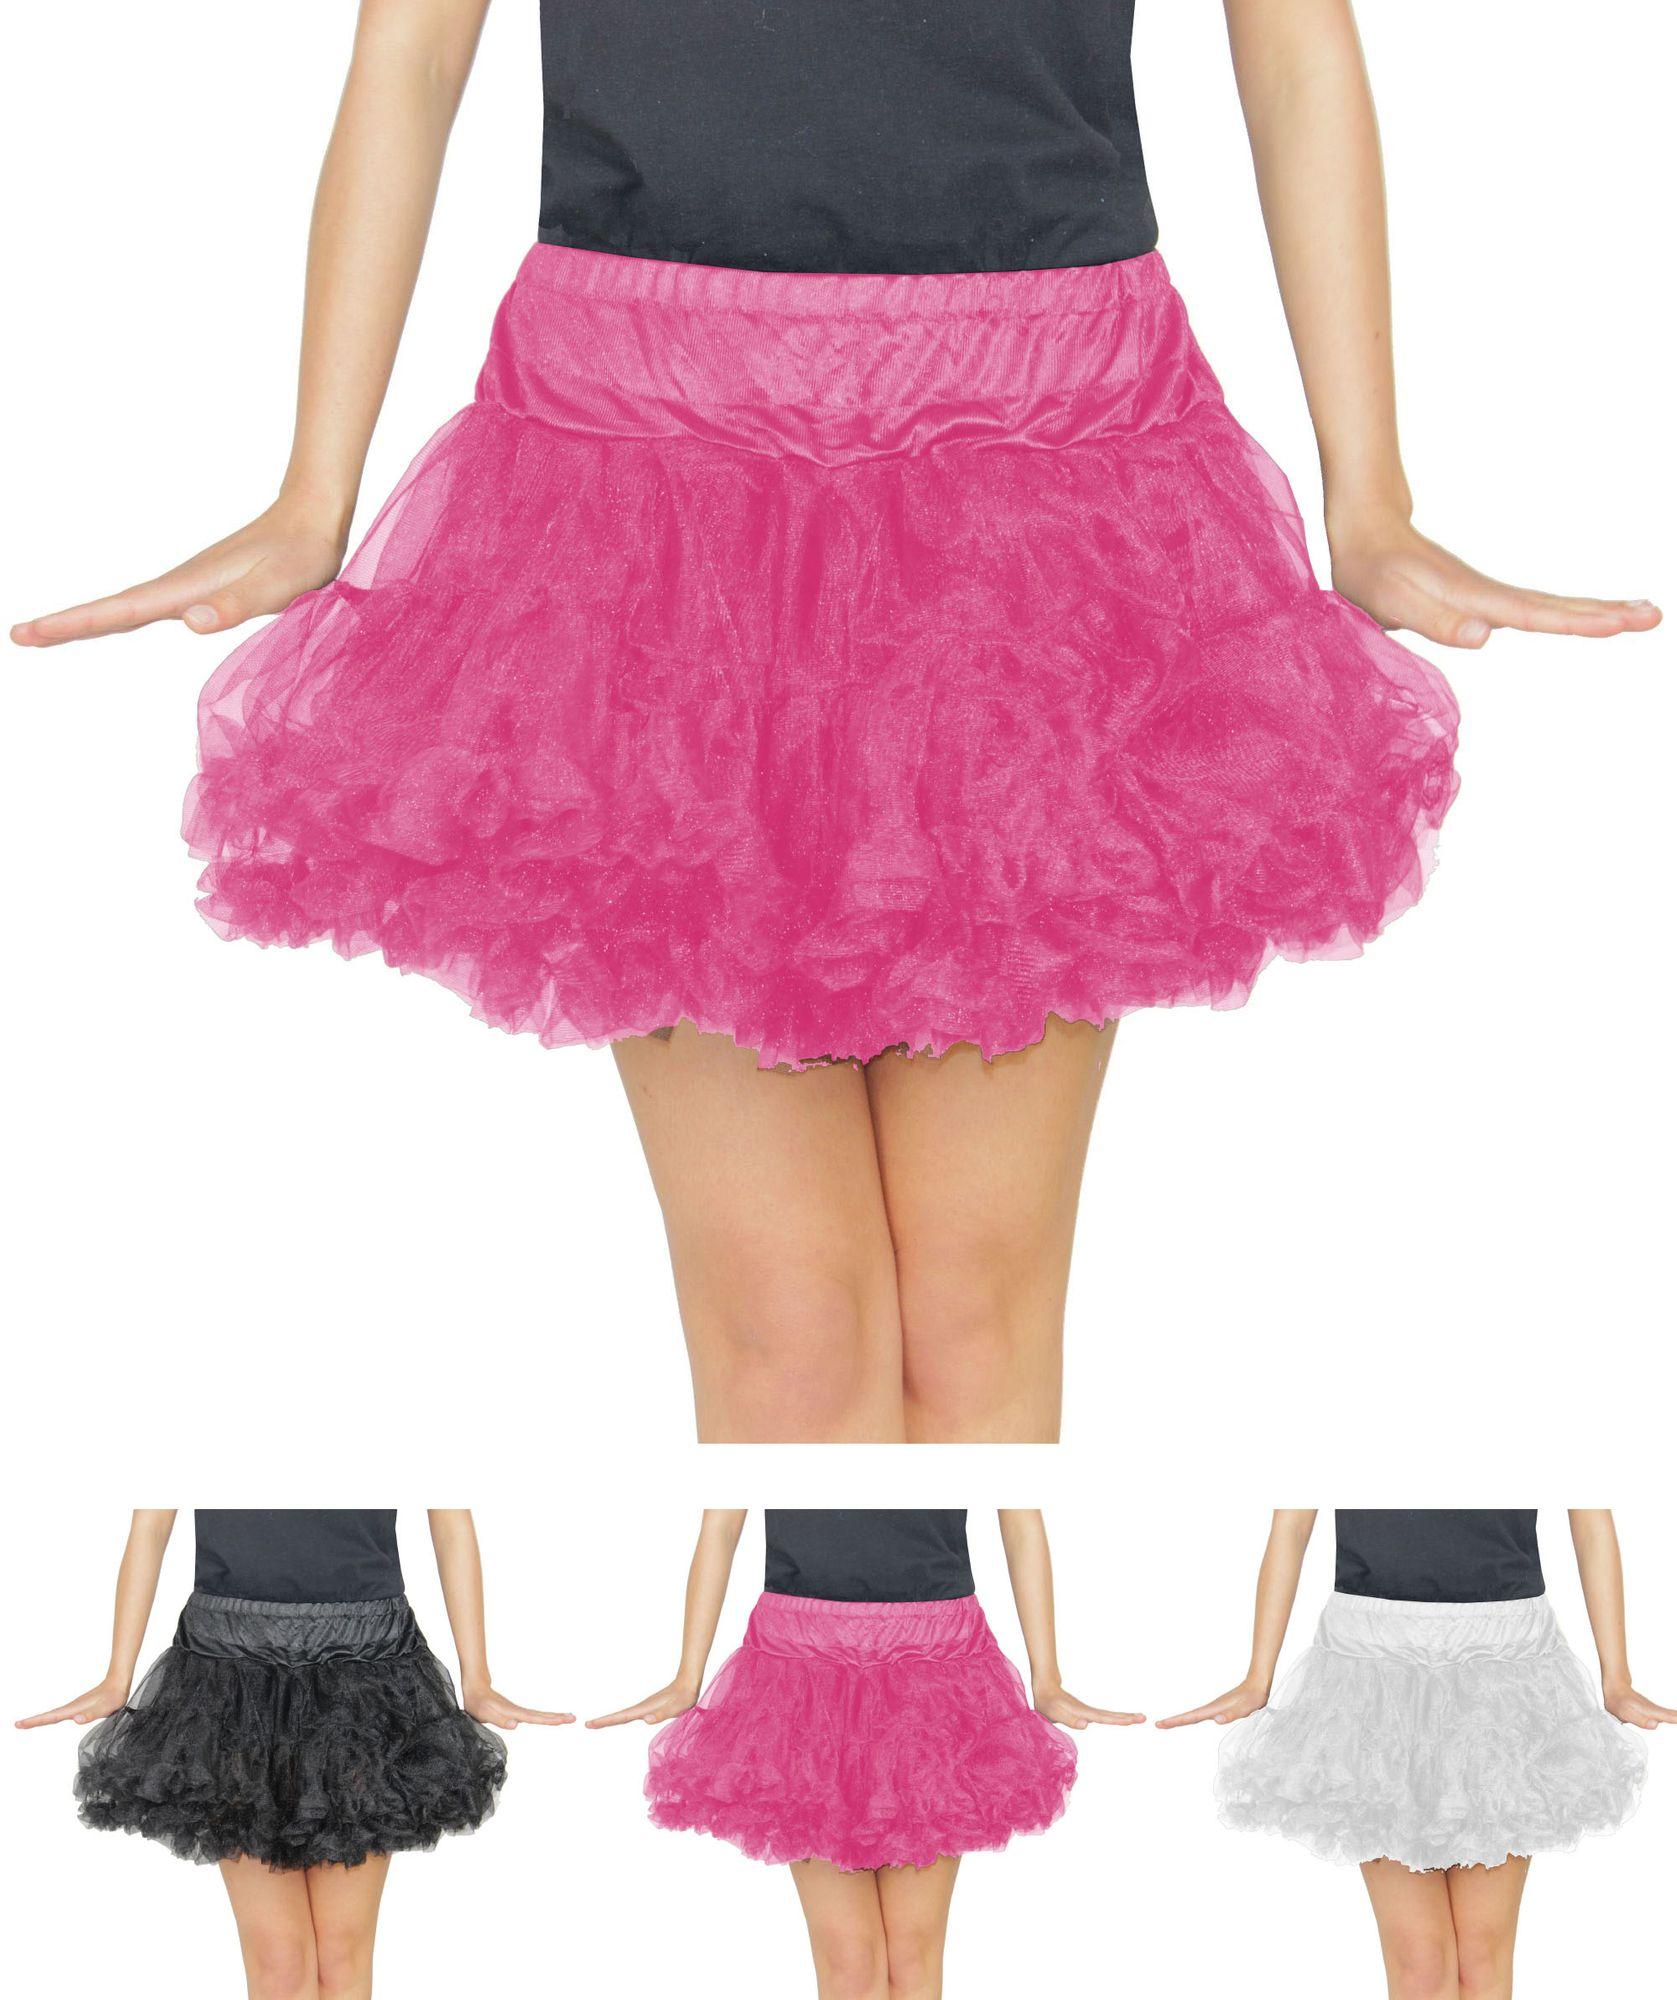 e6f1203723e0 pinkes Damen Tutu für Ballet Fasching Karneval Tüll Rock kurz pink